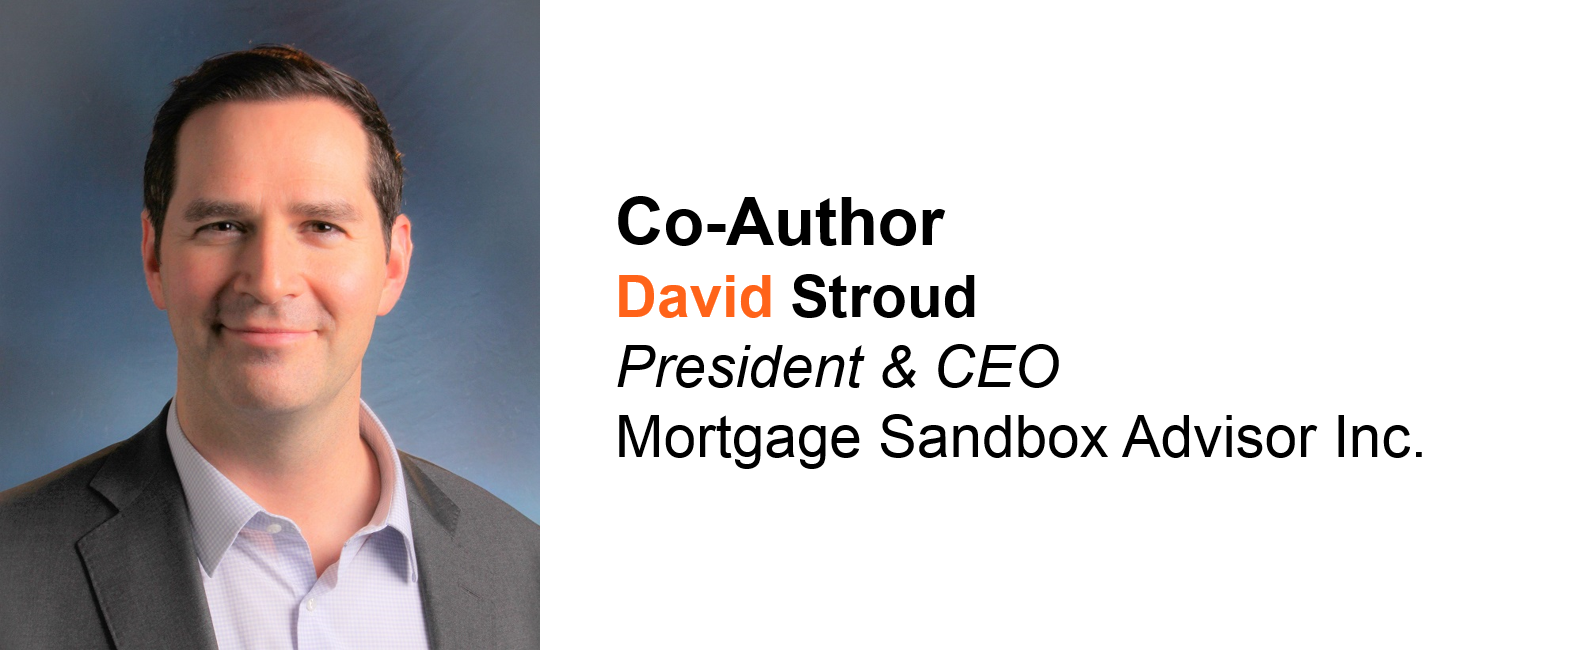 DavidStroud-author